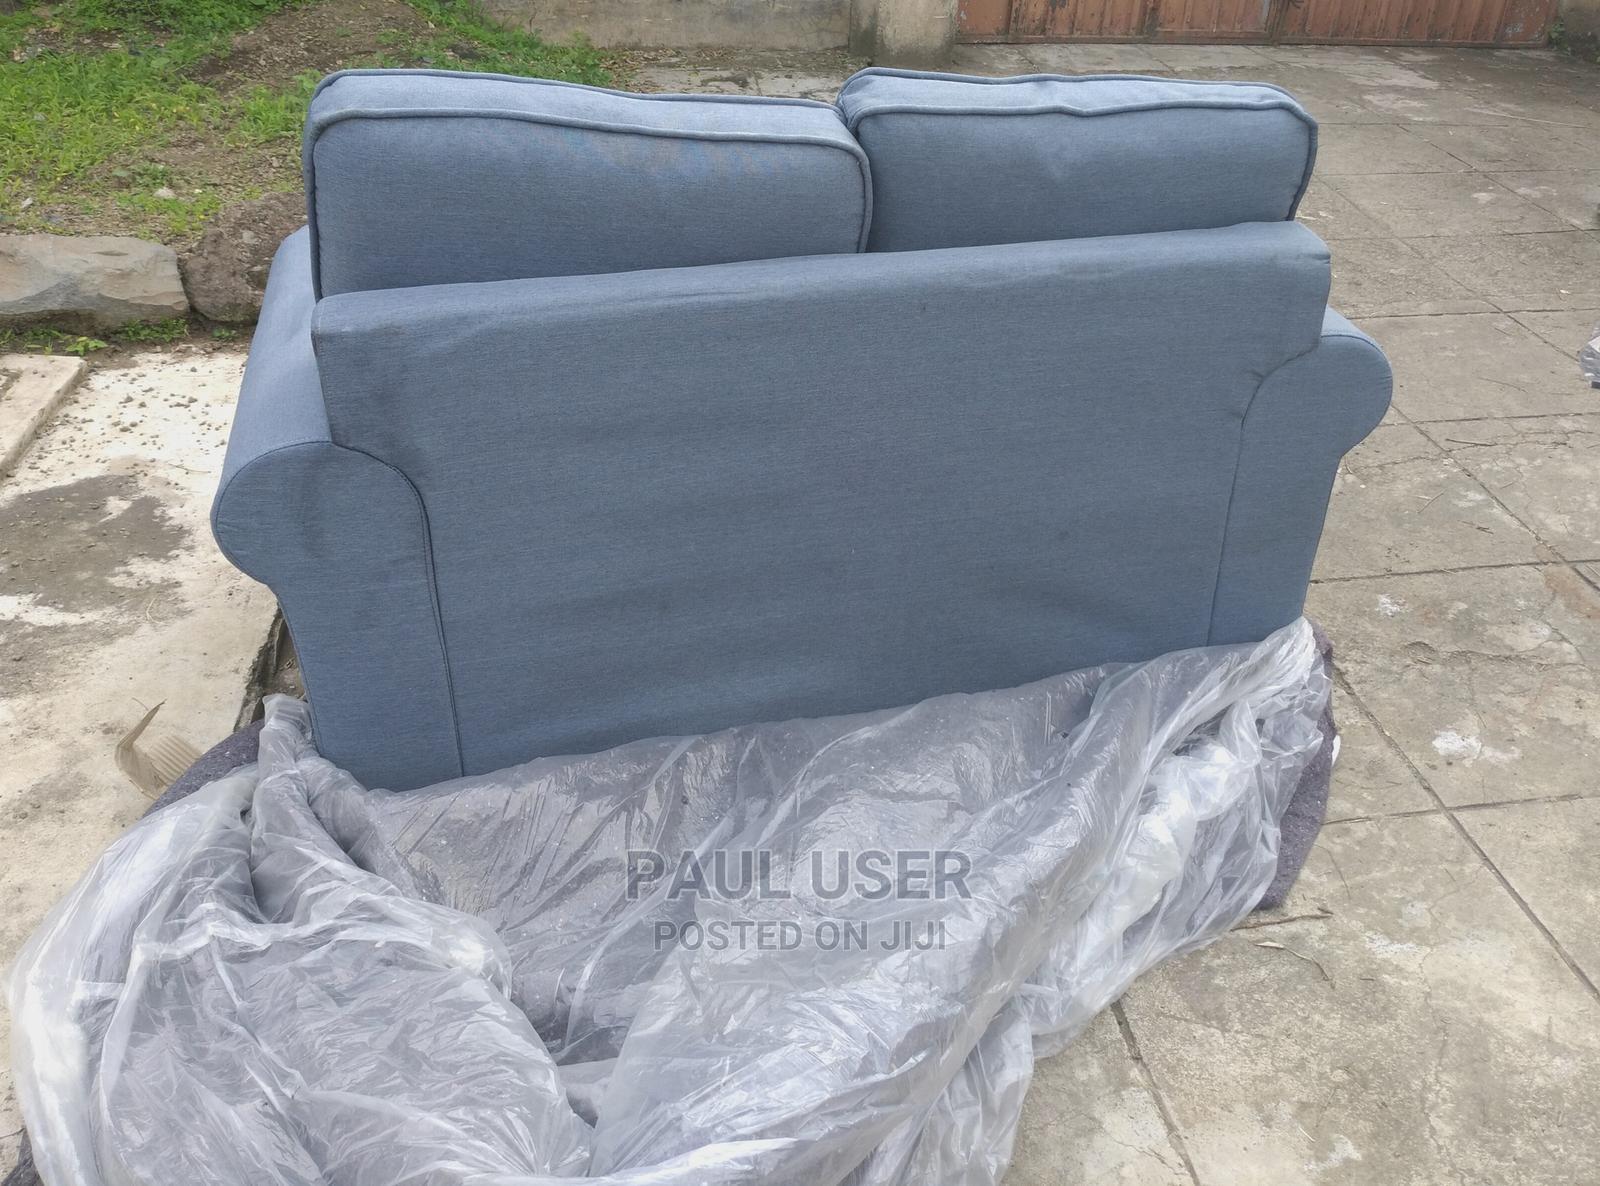 Imported Brand New American Style Fabric Sofa Set 1+1+2+3 | Furniture for sale in Ngong, Kajiado, Kenya